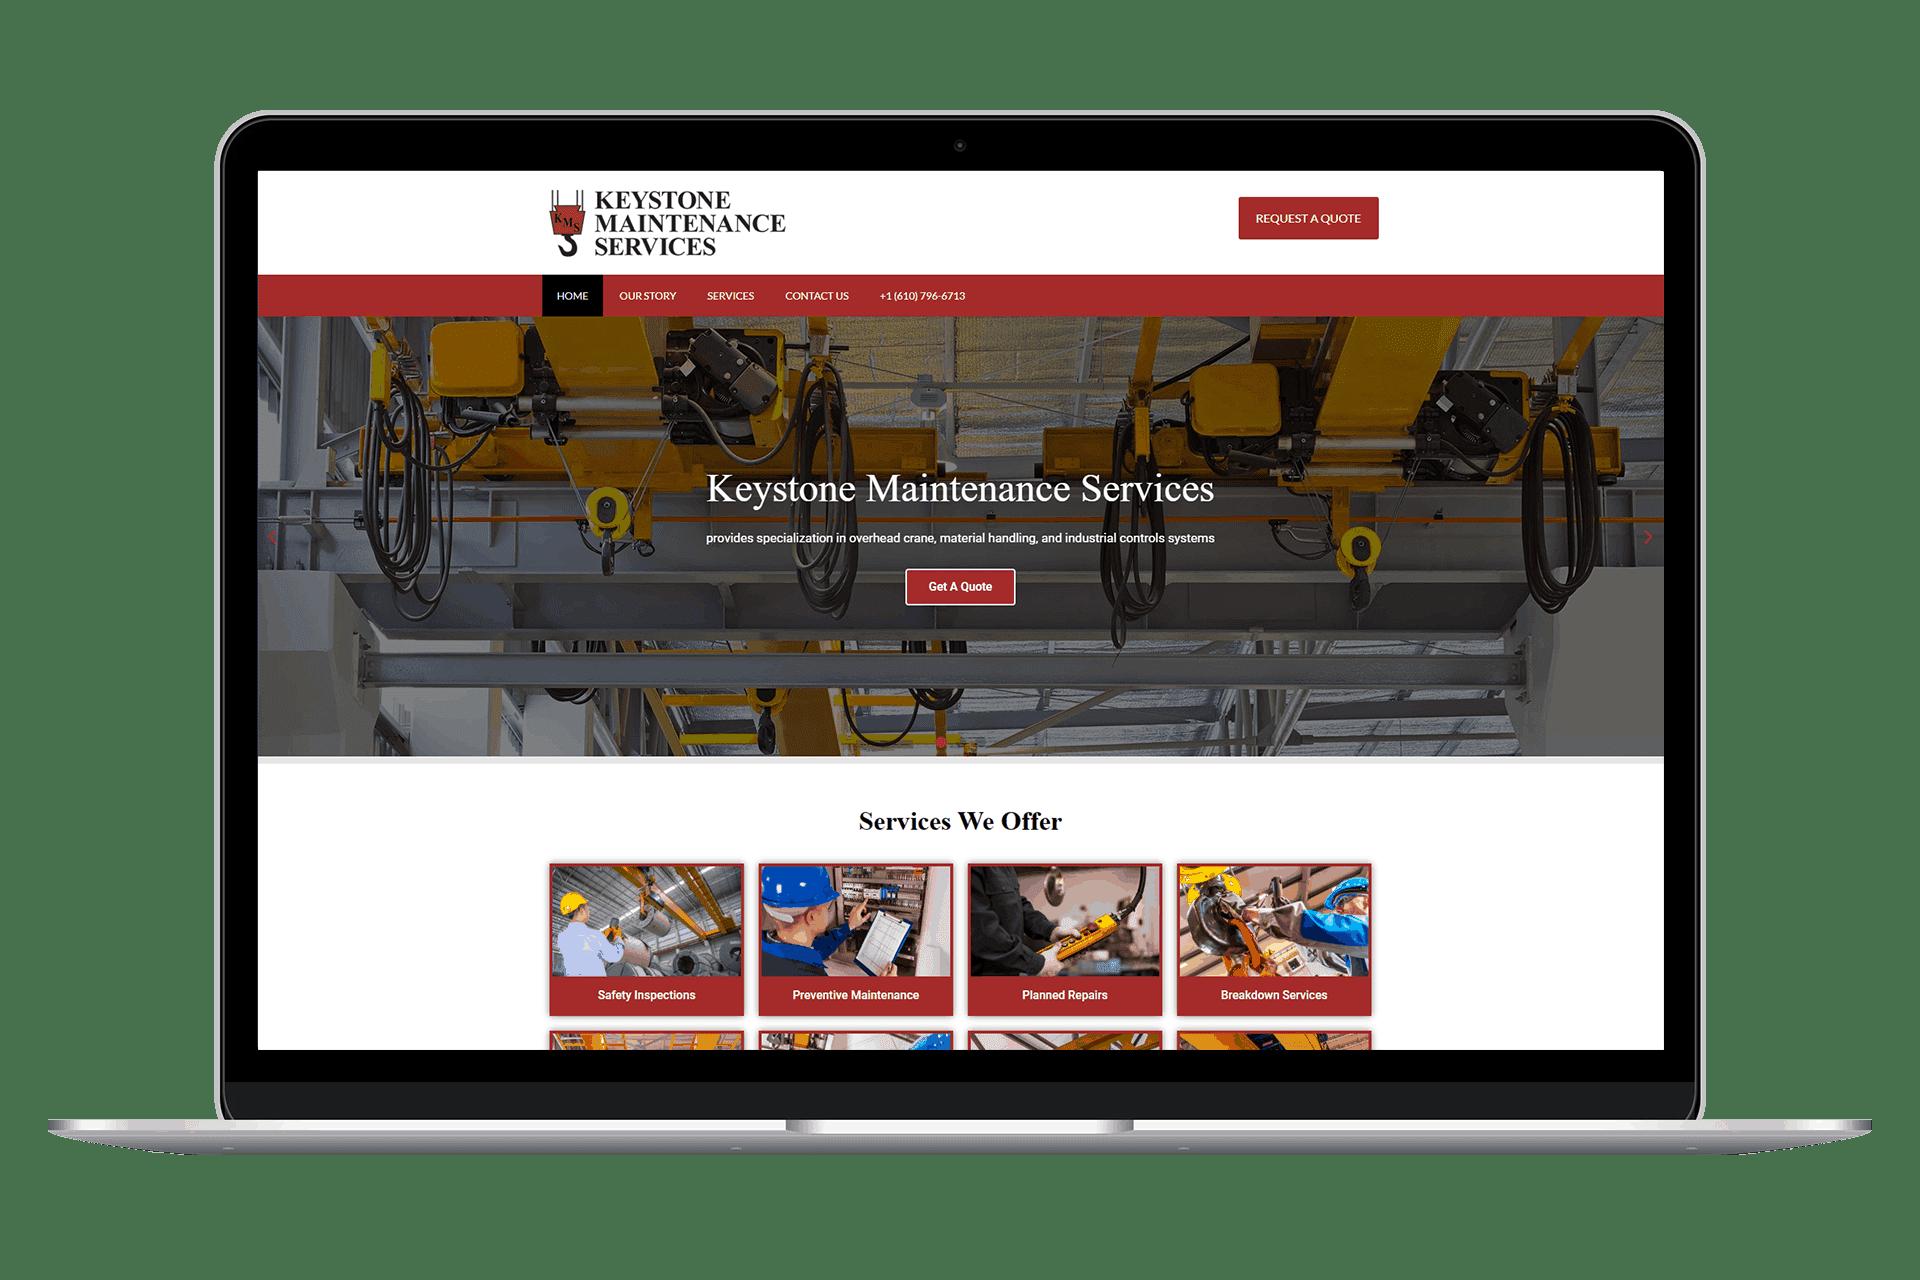 Keystone Maintenance Services